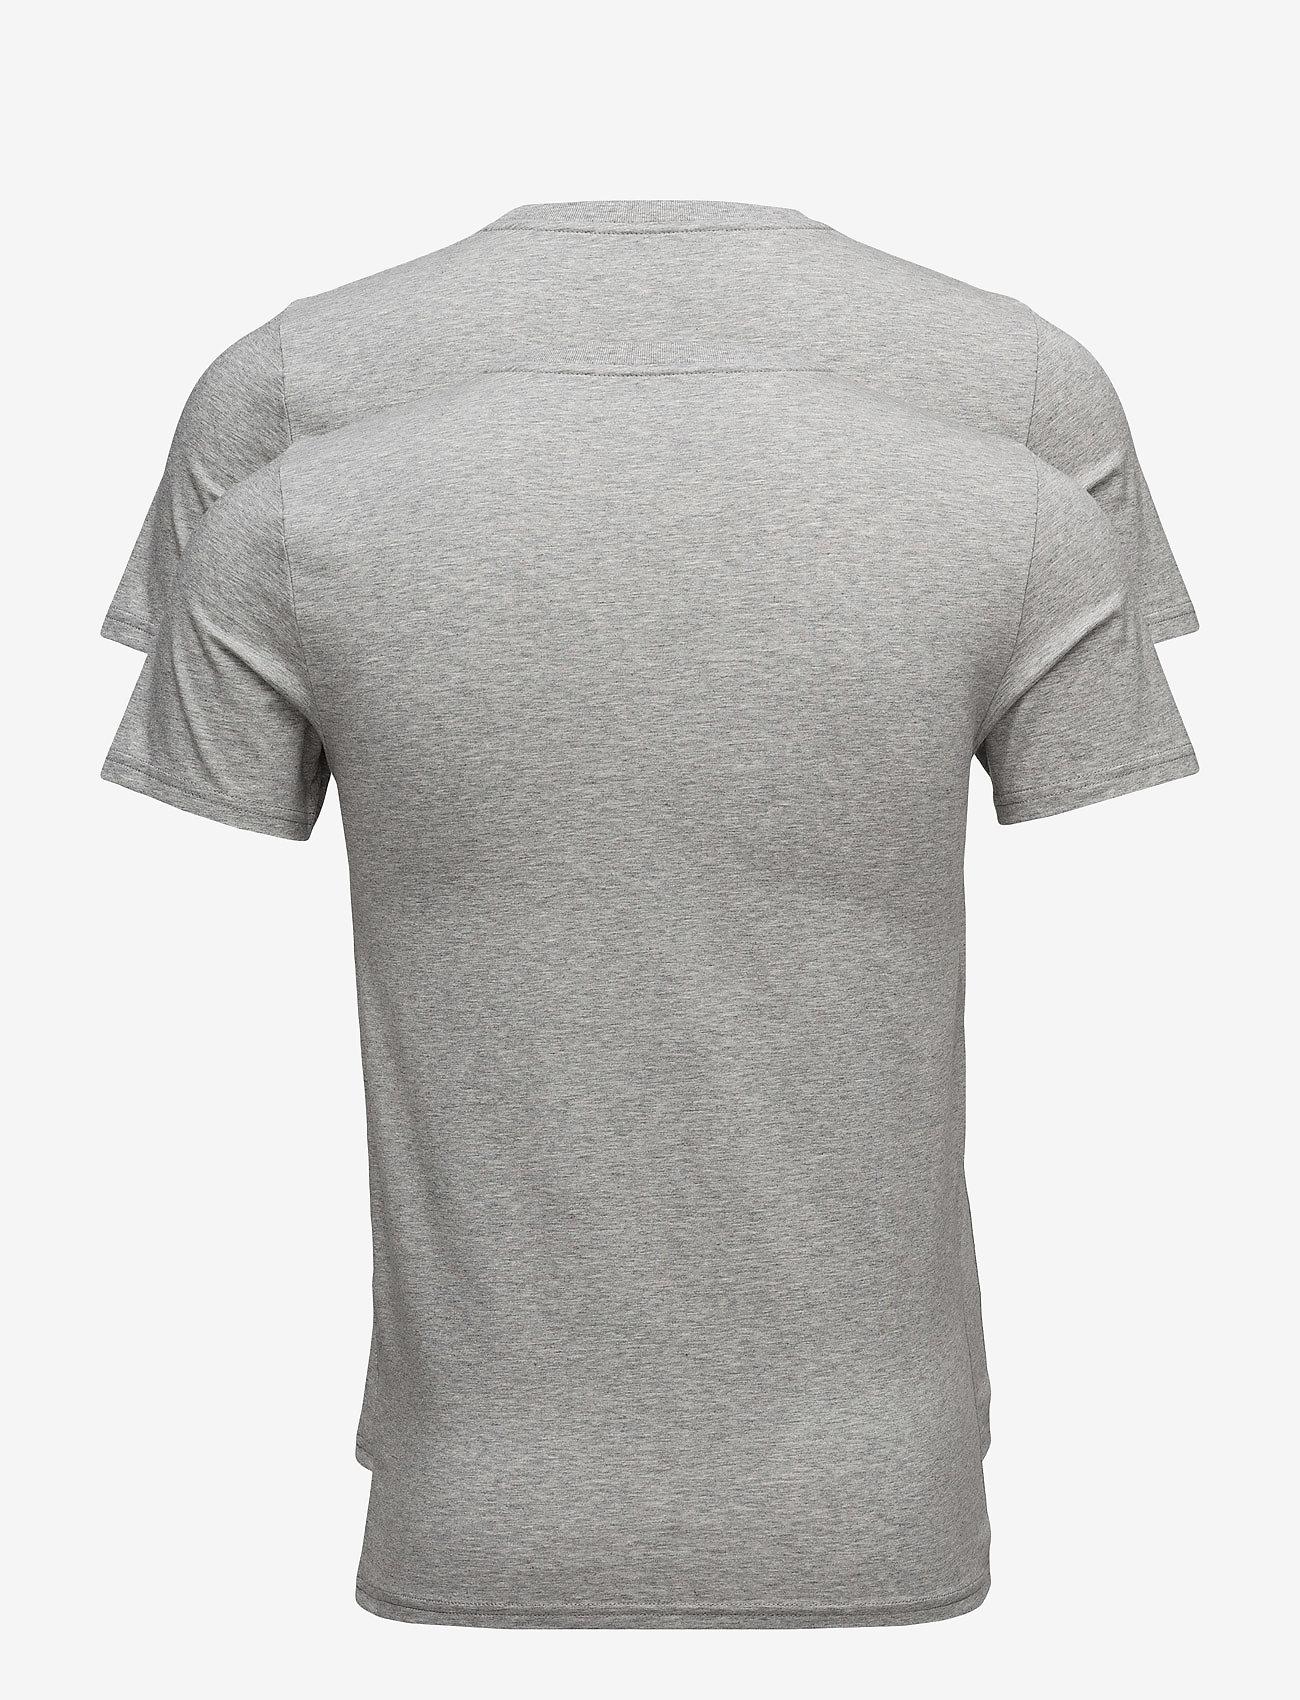 Polo Ralph Lauren Underwear - Crewneck T-Shirt 2-Pack - multipack - 2pk andover htr